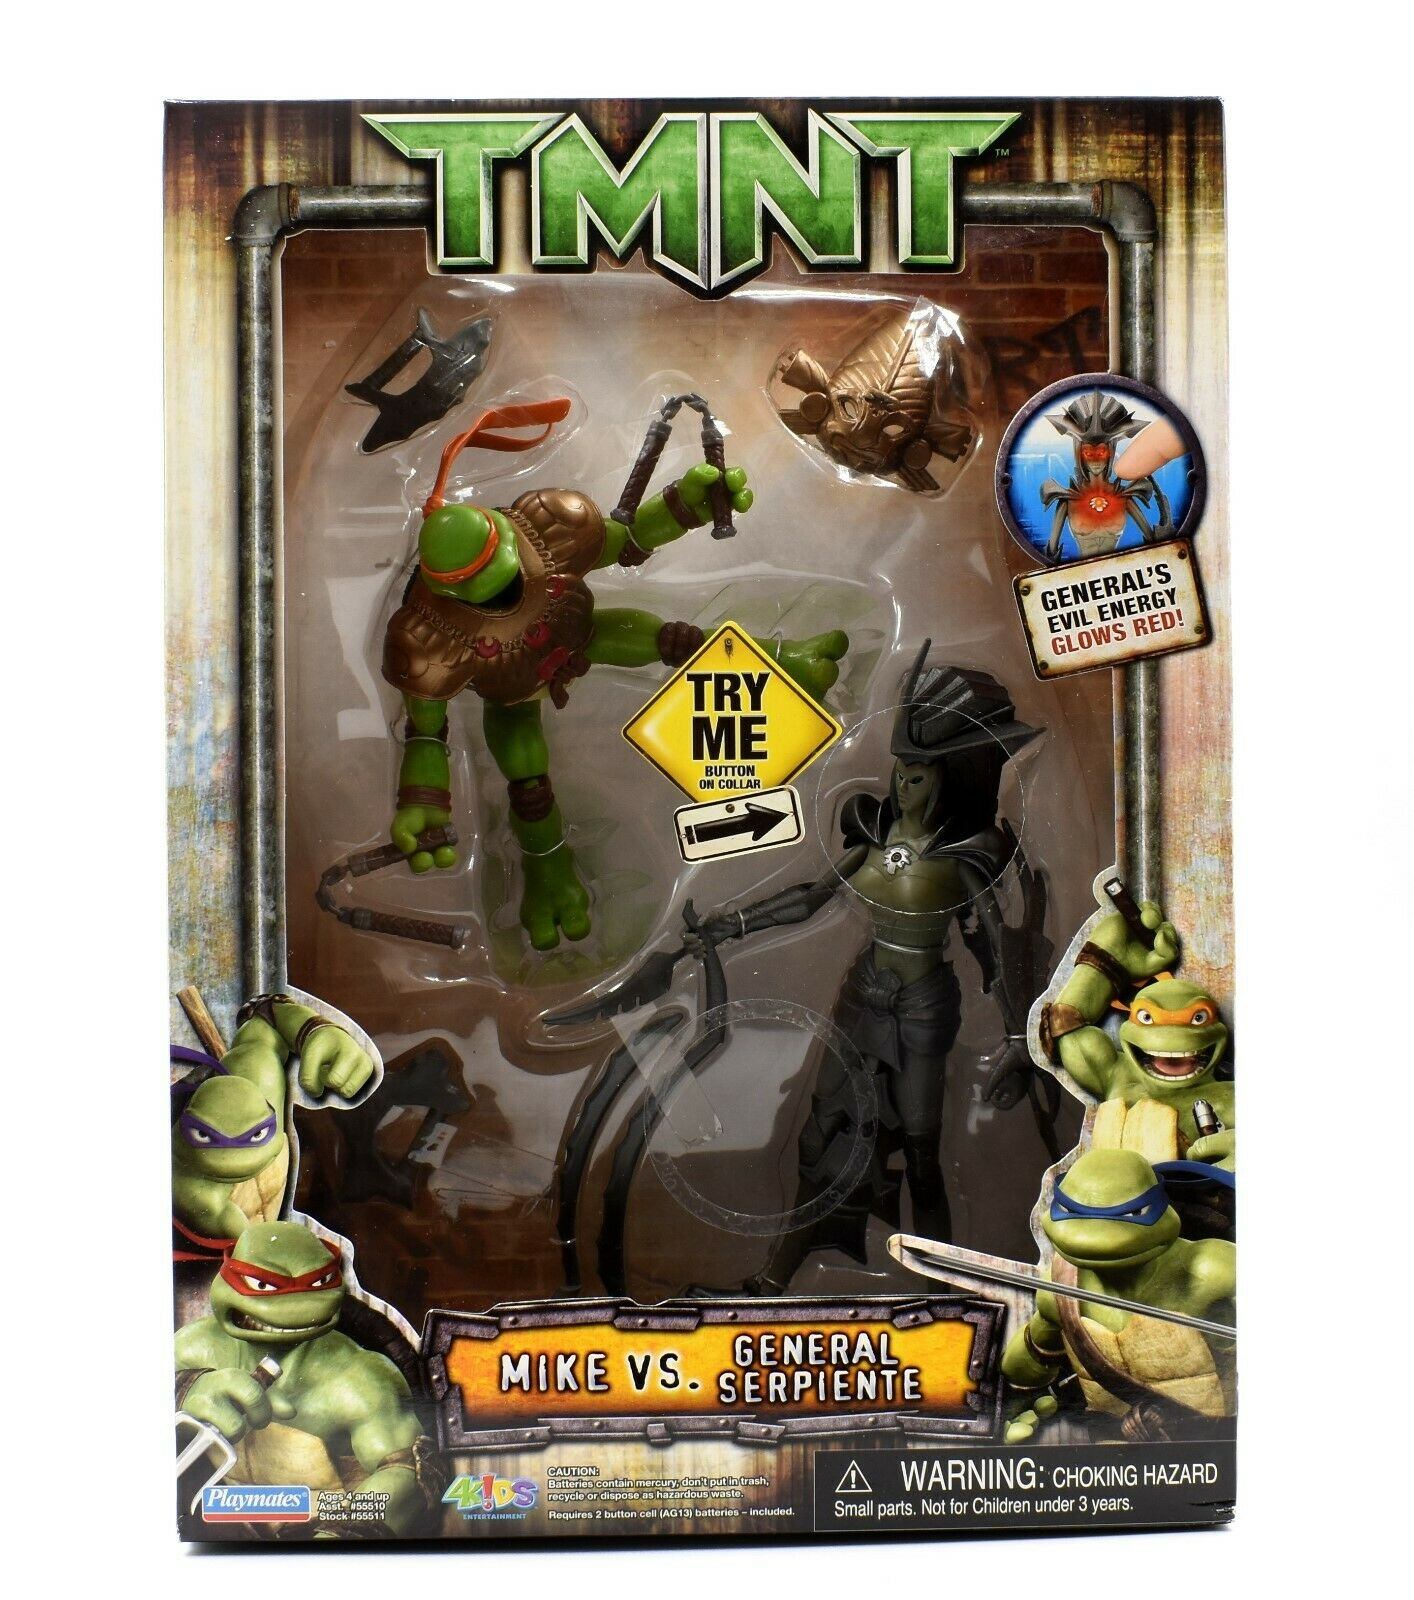 Teenage Mutant Ninja Turtles TMNT Movie - Mike vs. General Serpiente Figure Set